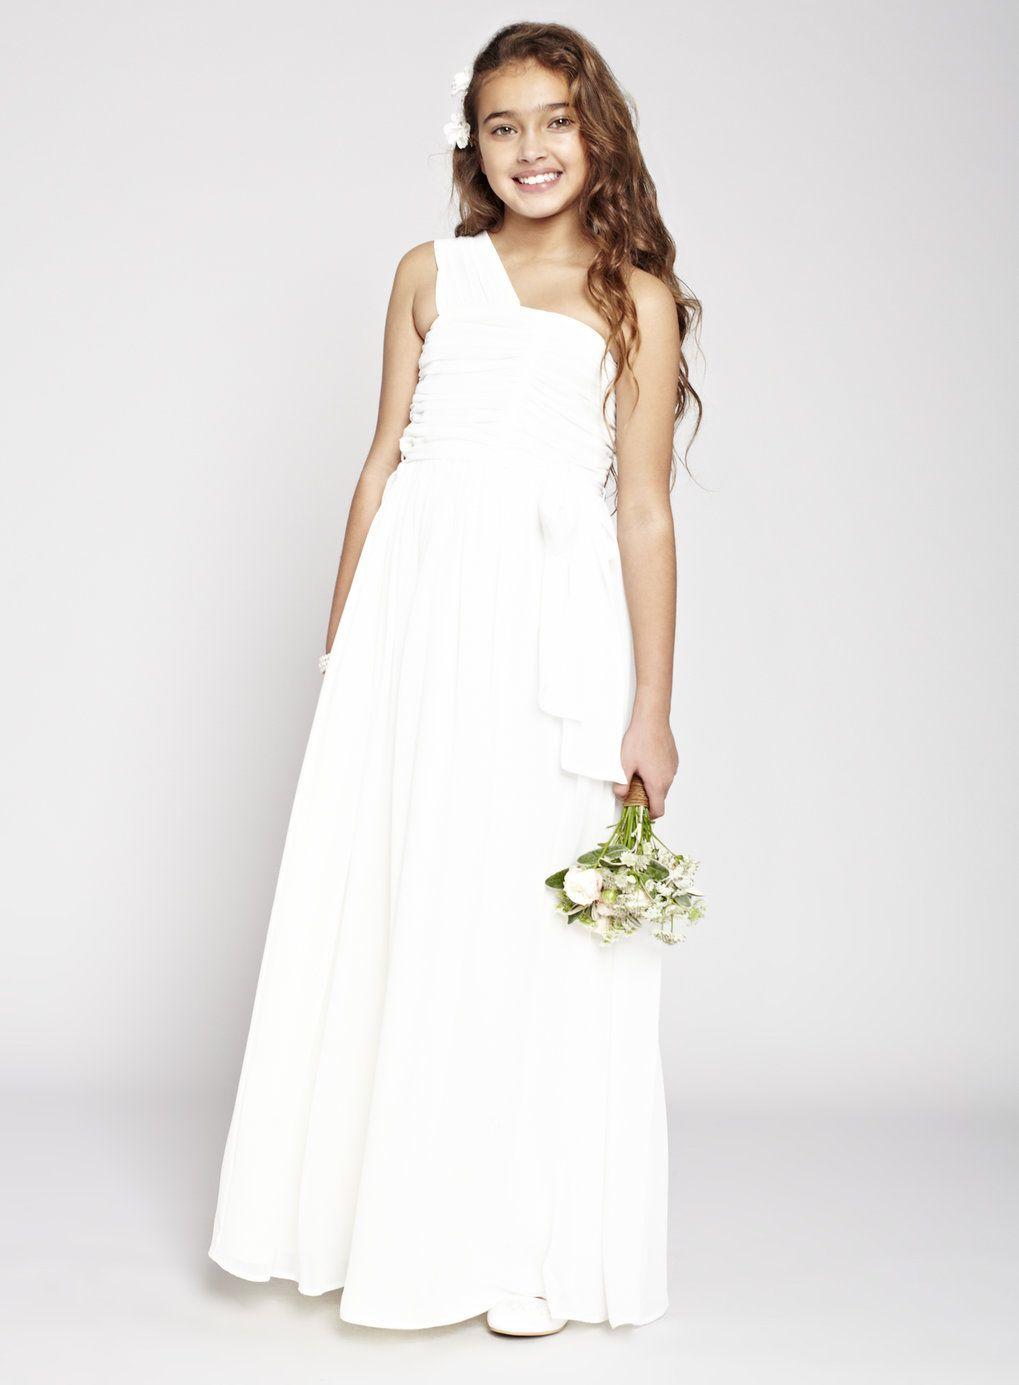 Long bridesmaids dresses uk age 10 11 google search wedding x long bridesmaids dresses uk age 10 11 google search ombrellifo Gallery